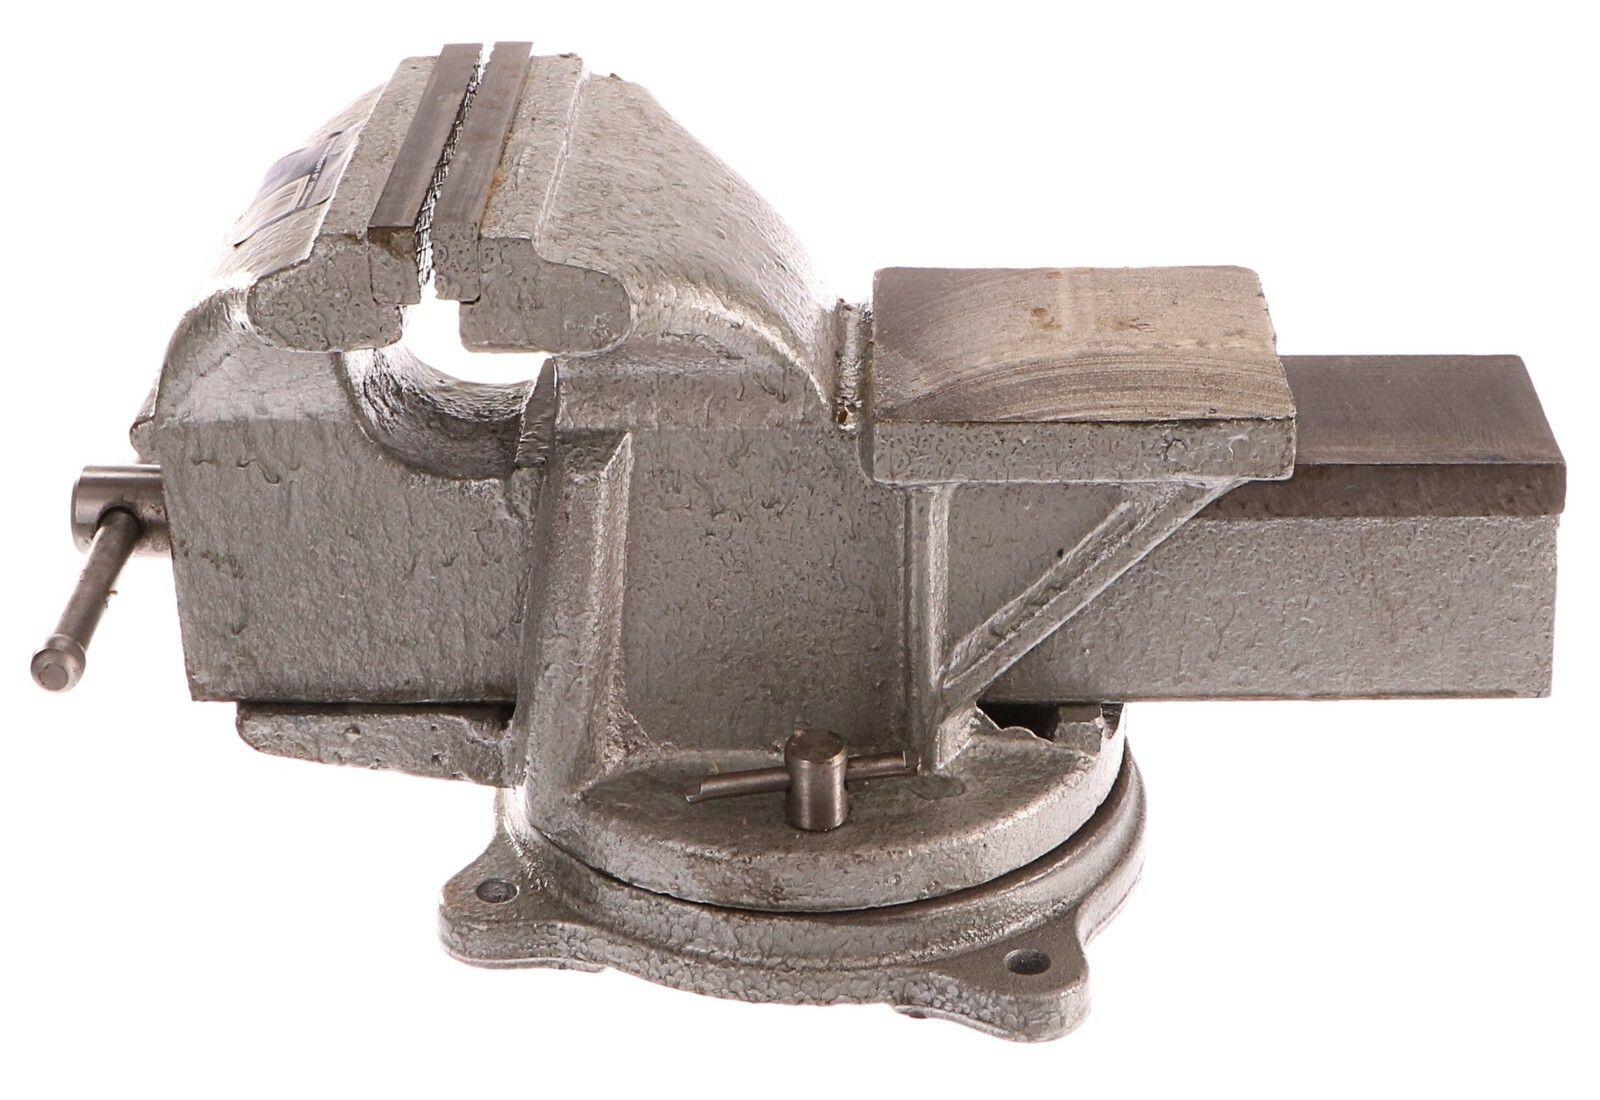 "Svěrák otočný s kovadlinou PROFI, 150mm/6"", 24kg GEKO"